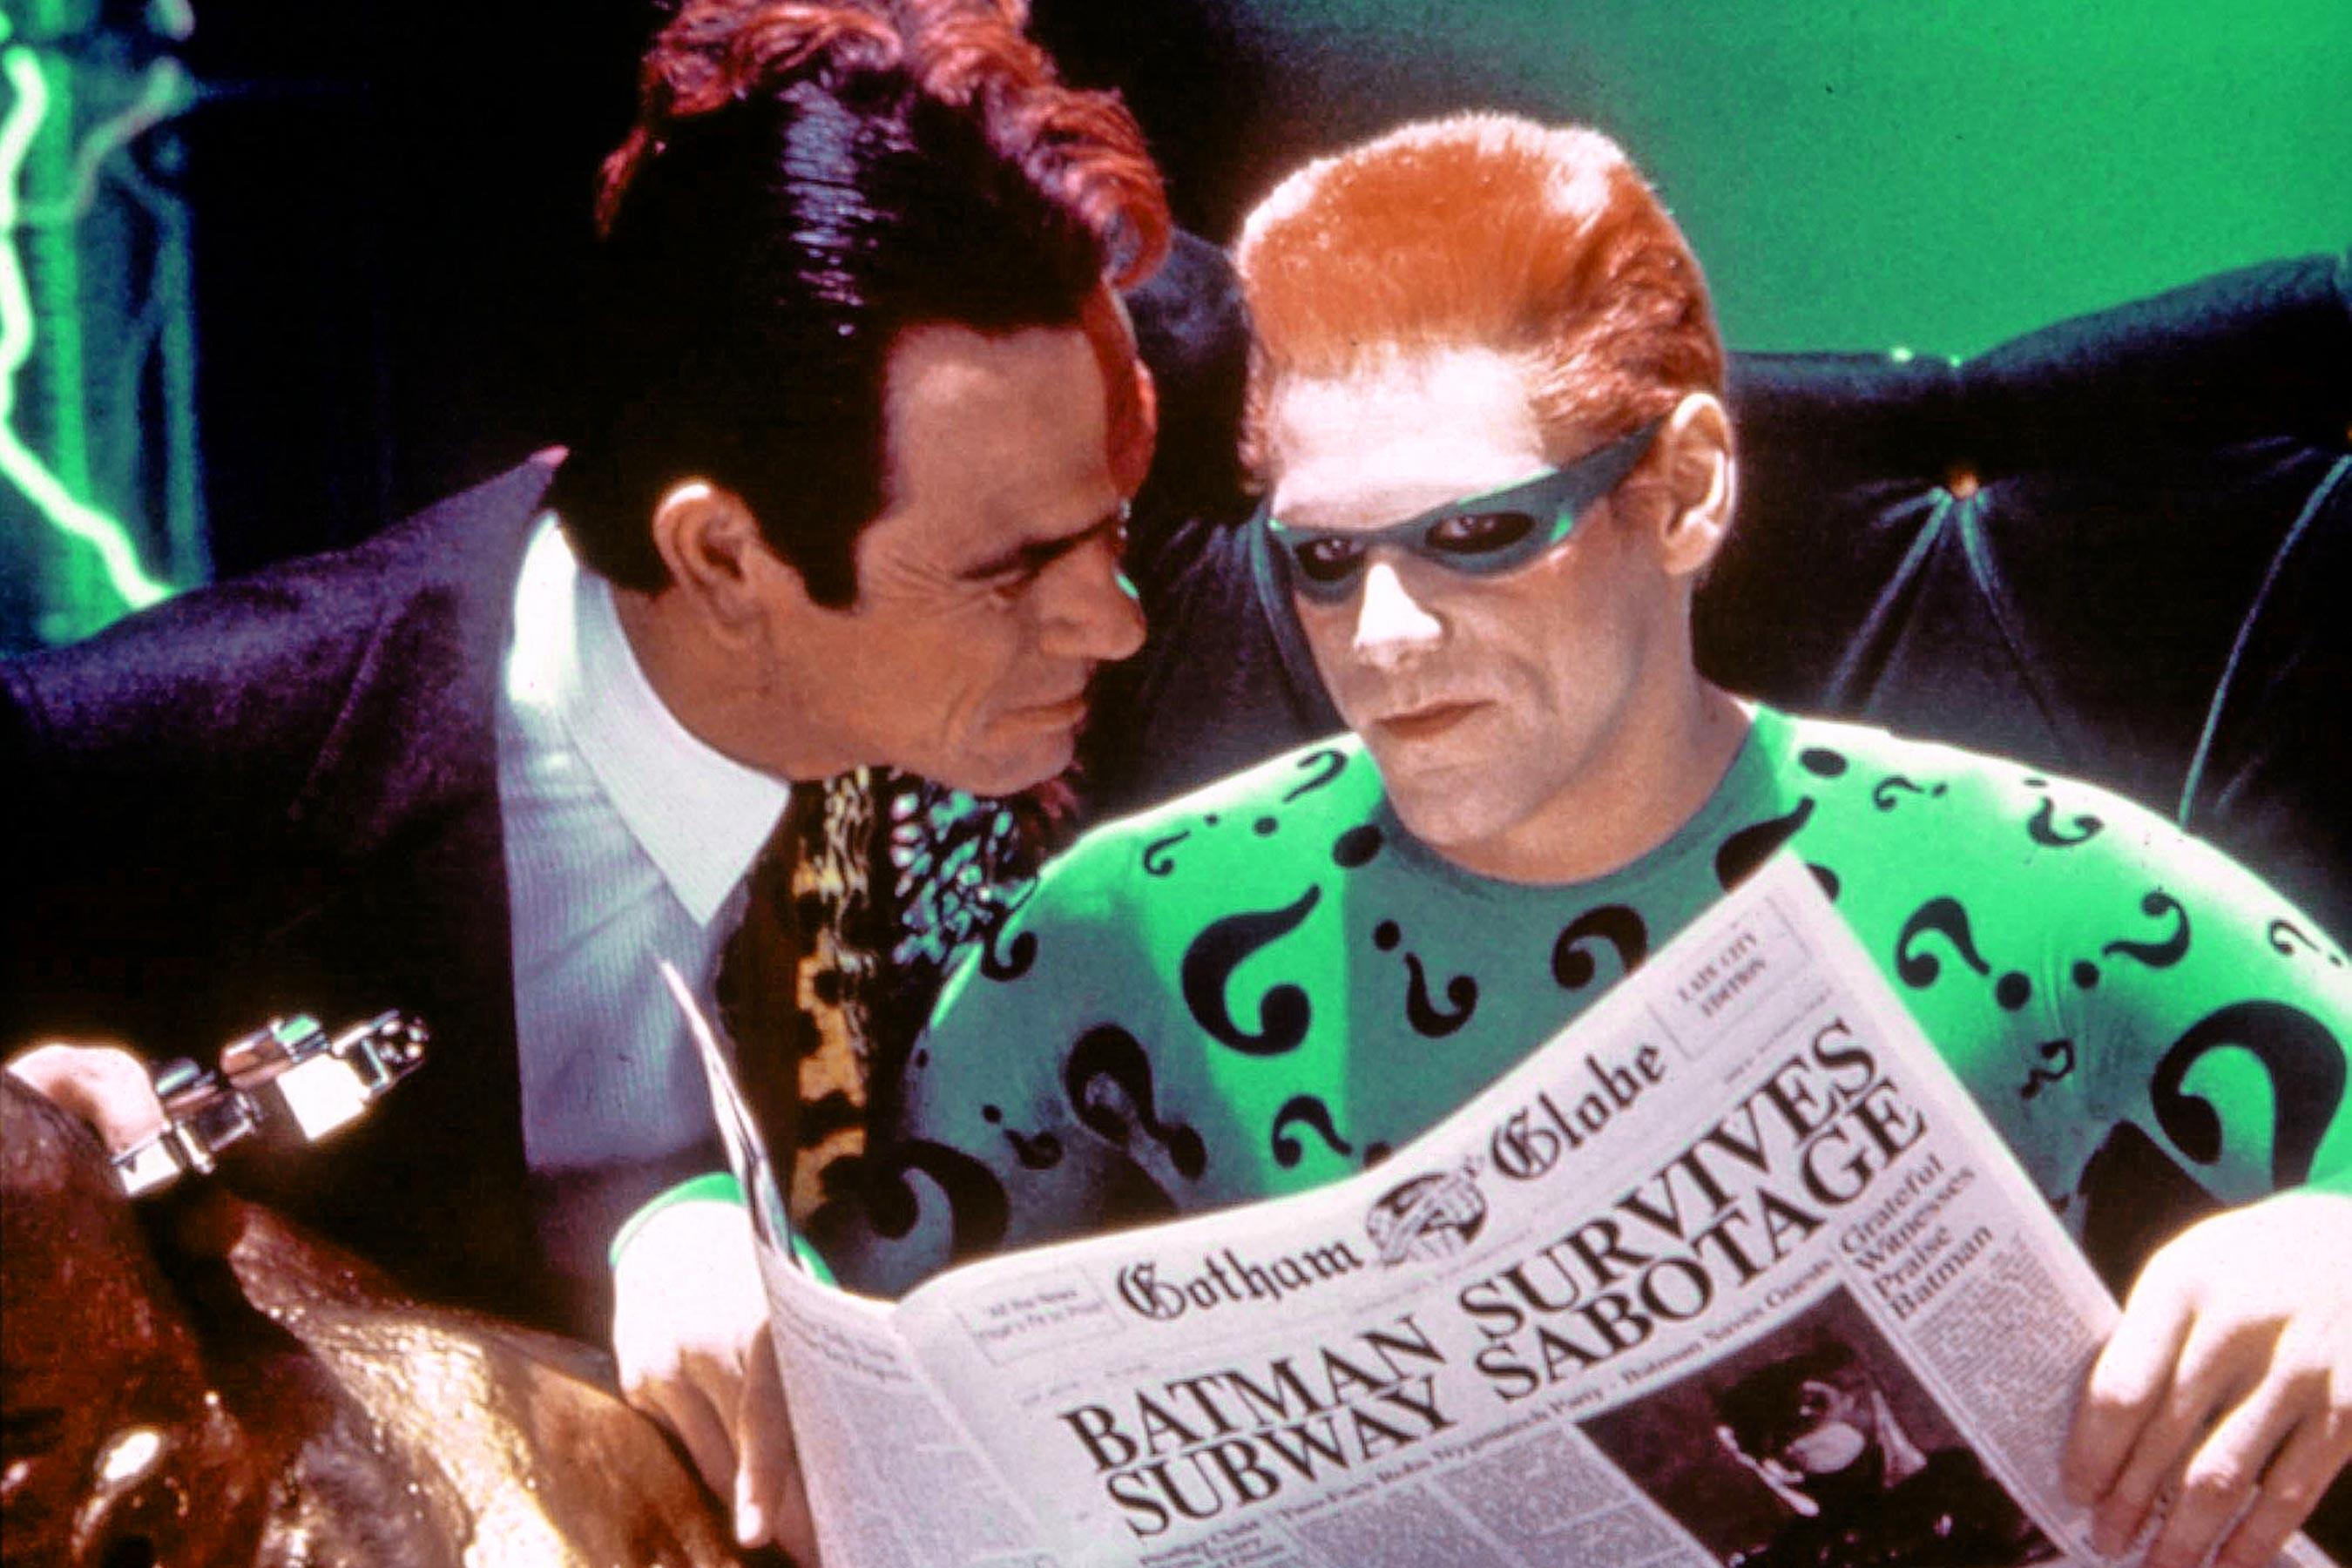 Batman Forever e quel difficile rapporto tra Tommy Lee Jones e Jim Carrey sul set